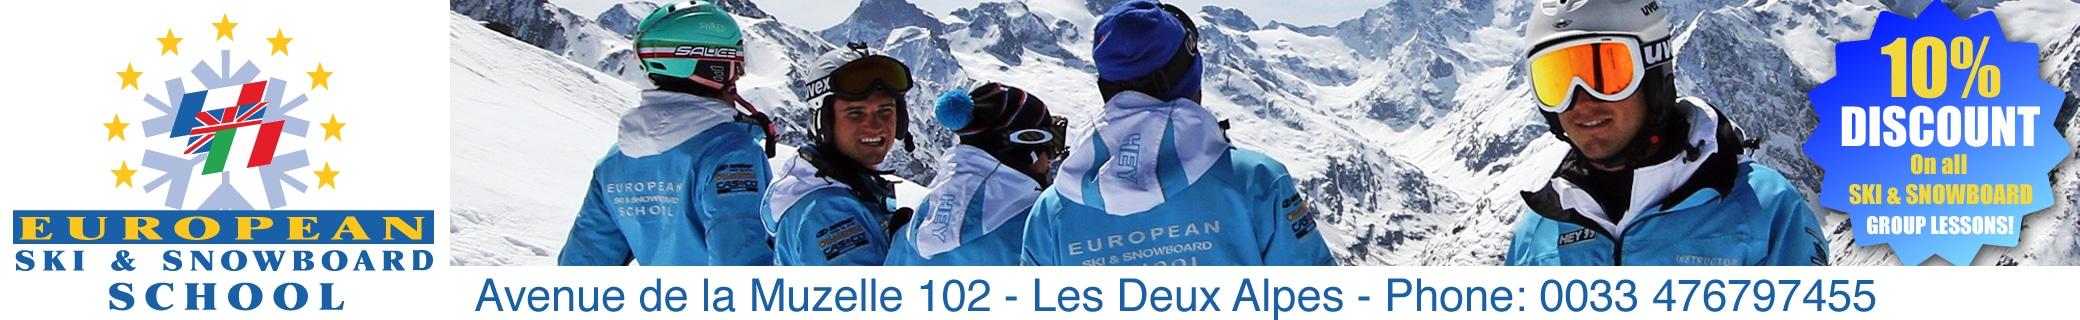 Les Deux Alpes Ski School